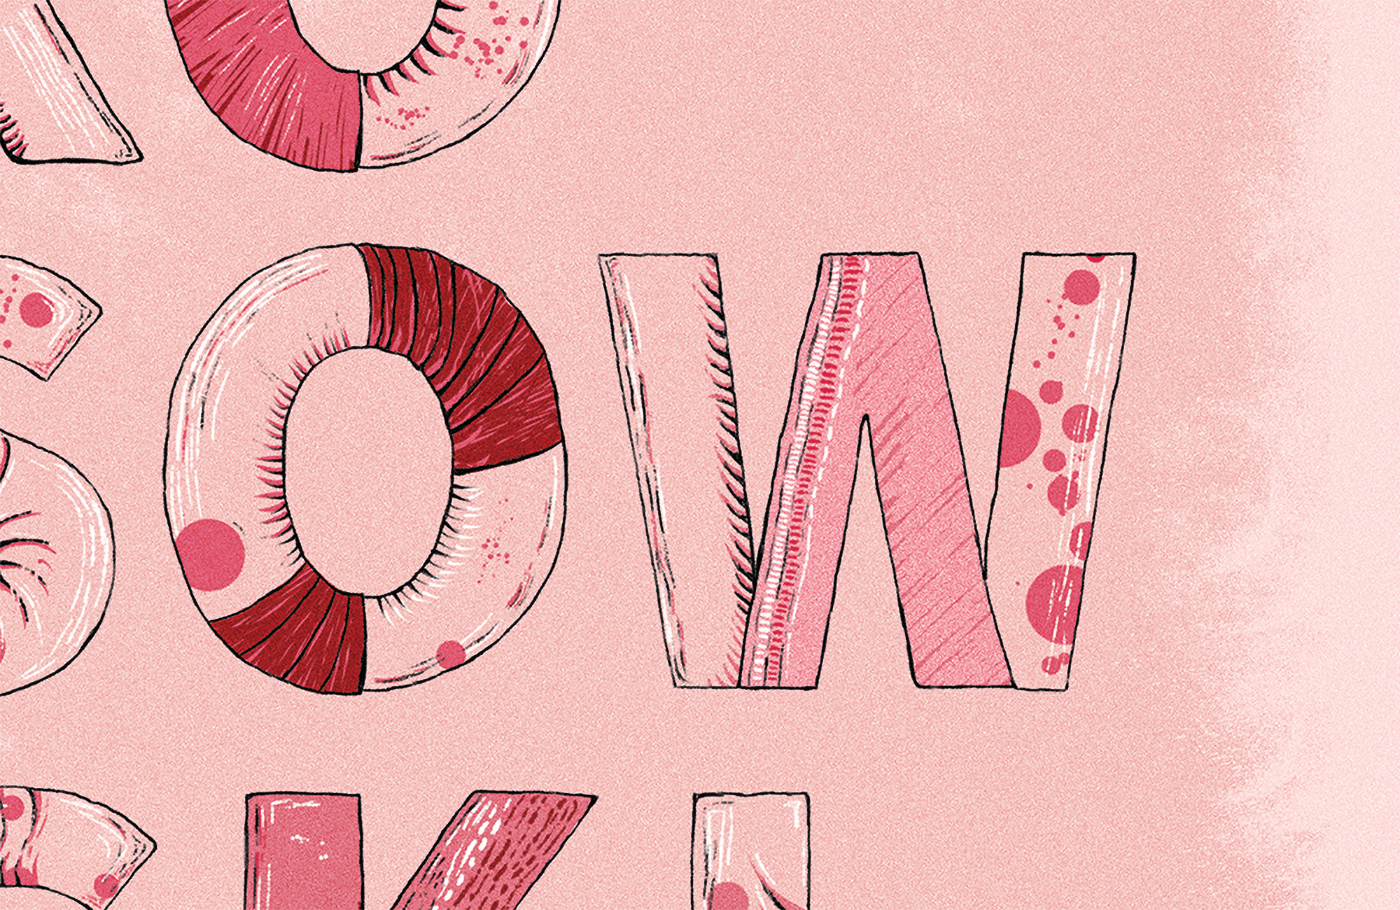 poster plakat typo typografia litera ilustracja kosowski study studia